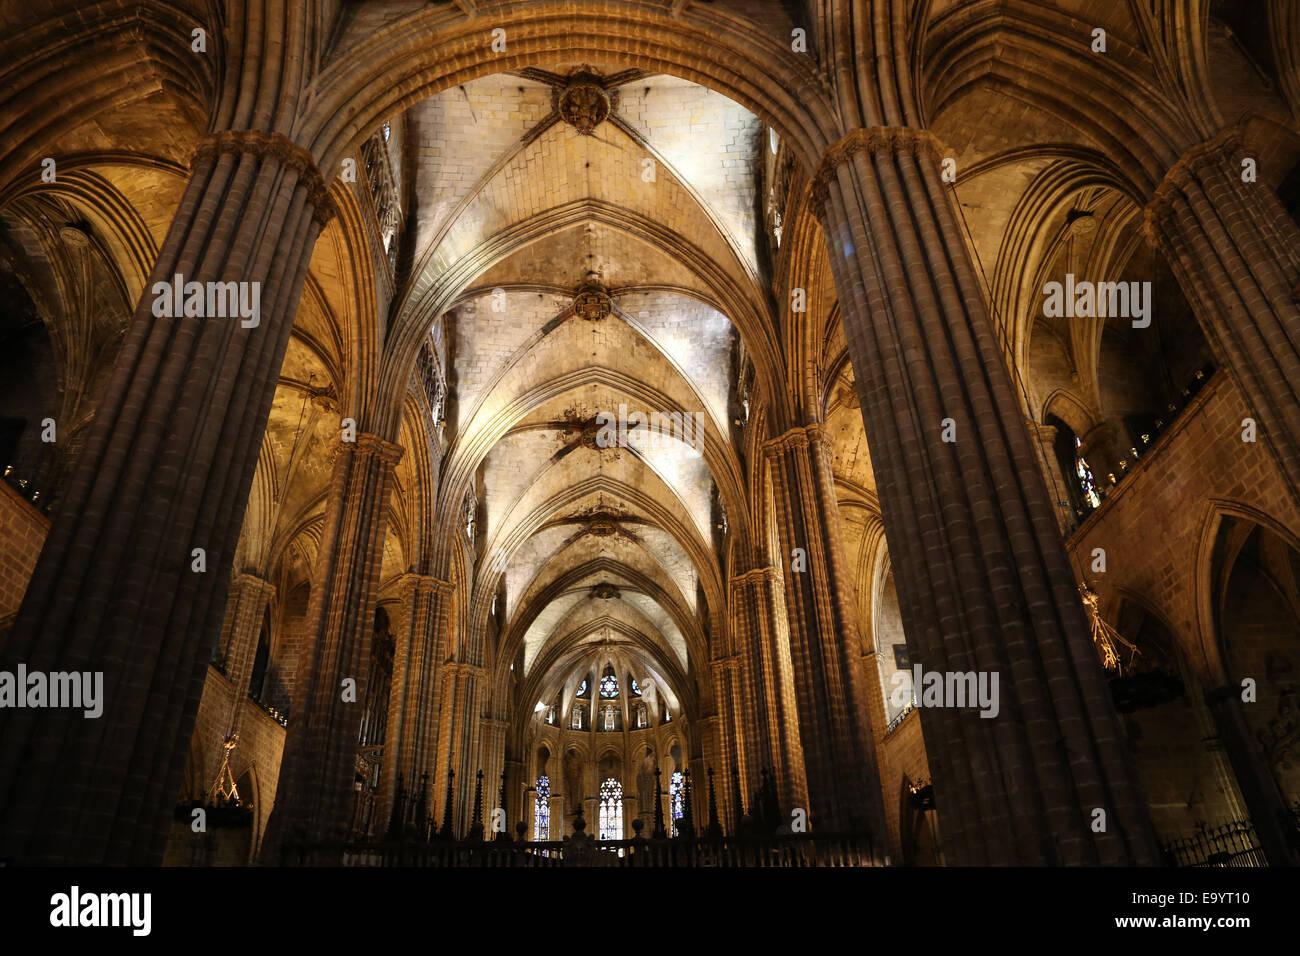 Spanien. Katalonien. Kathedrale von Barcelona. Im Inneren. 13. Jahrhundert. Stockbild